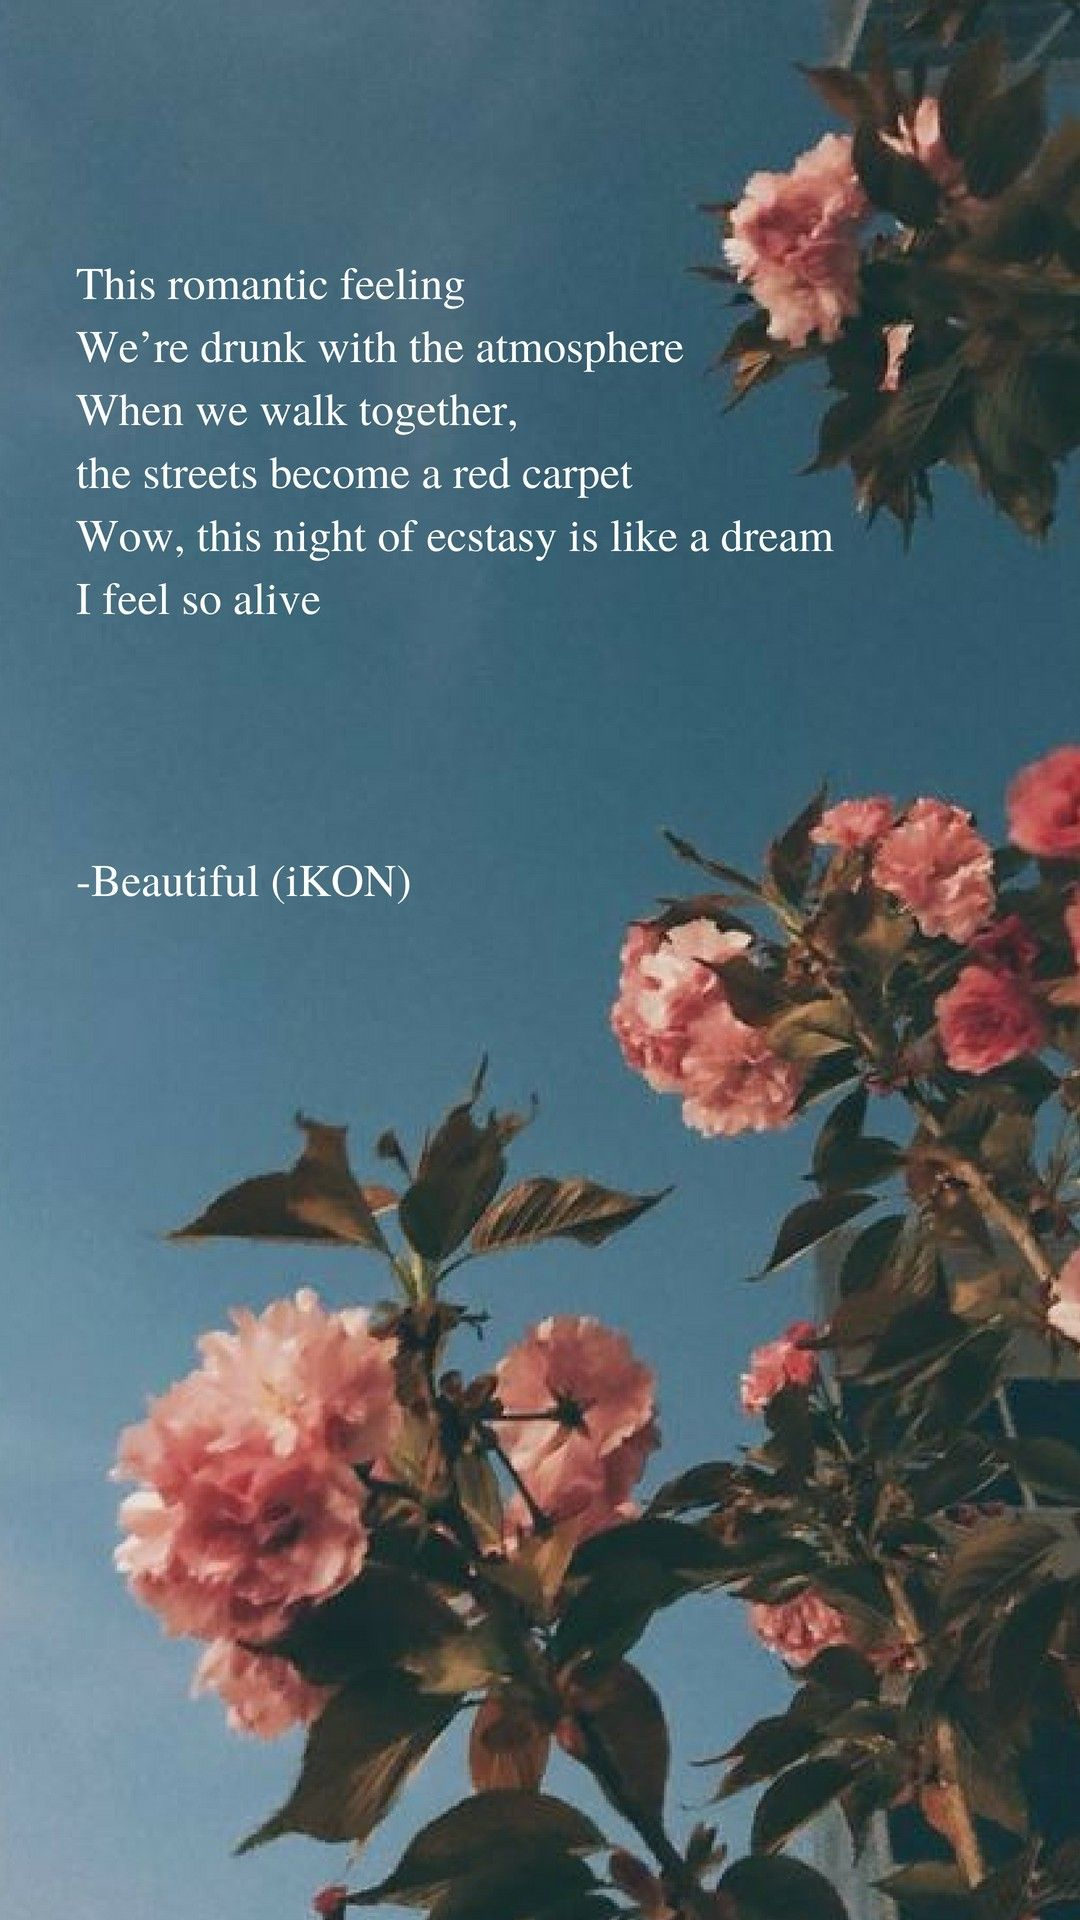 Beautiful By Ikon Lyrics Wallpaper Ikon Wallpaper Ikon Songs Lyrics Aesthetic ikon lyrics wallpaper